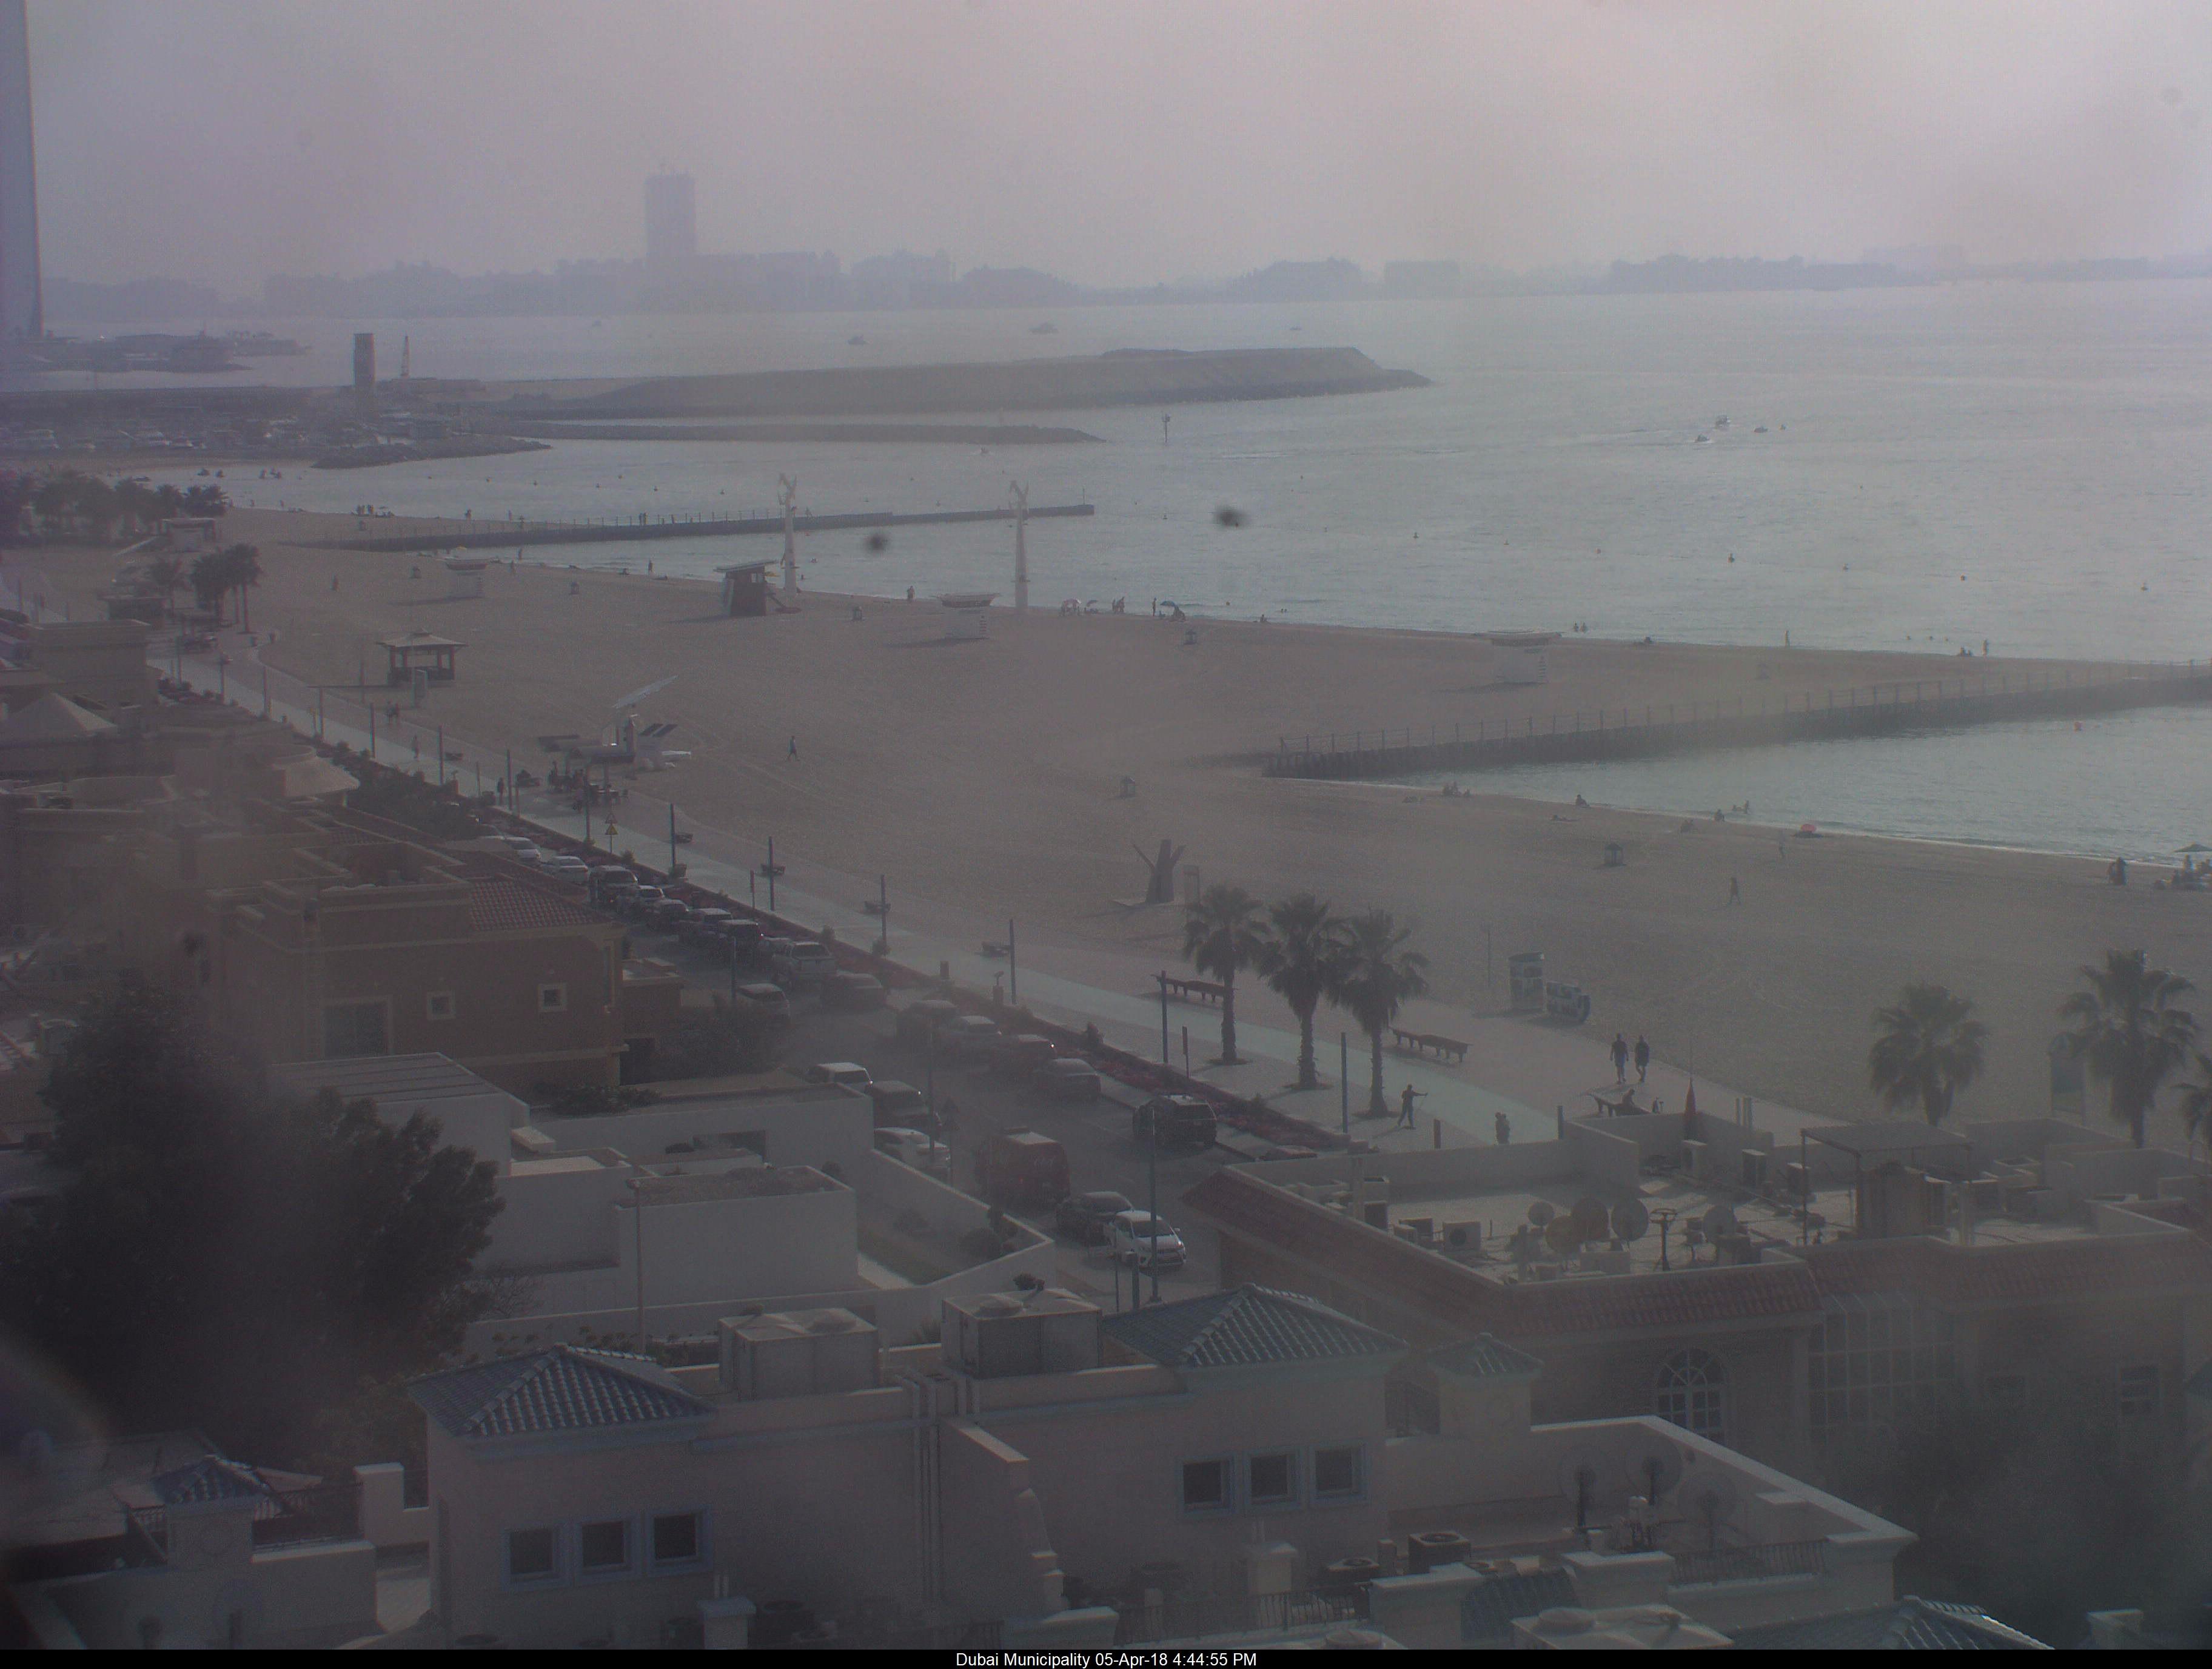 Онлайн веб камера ОАЭ Дубай пляж Умм-Сукейм